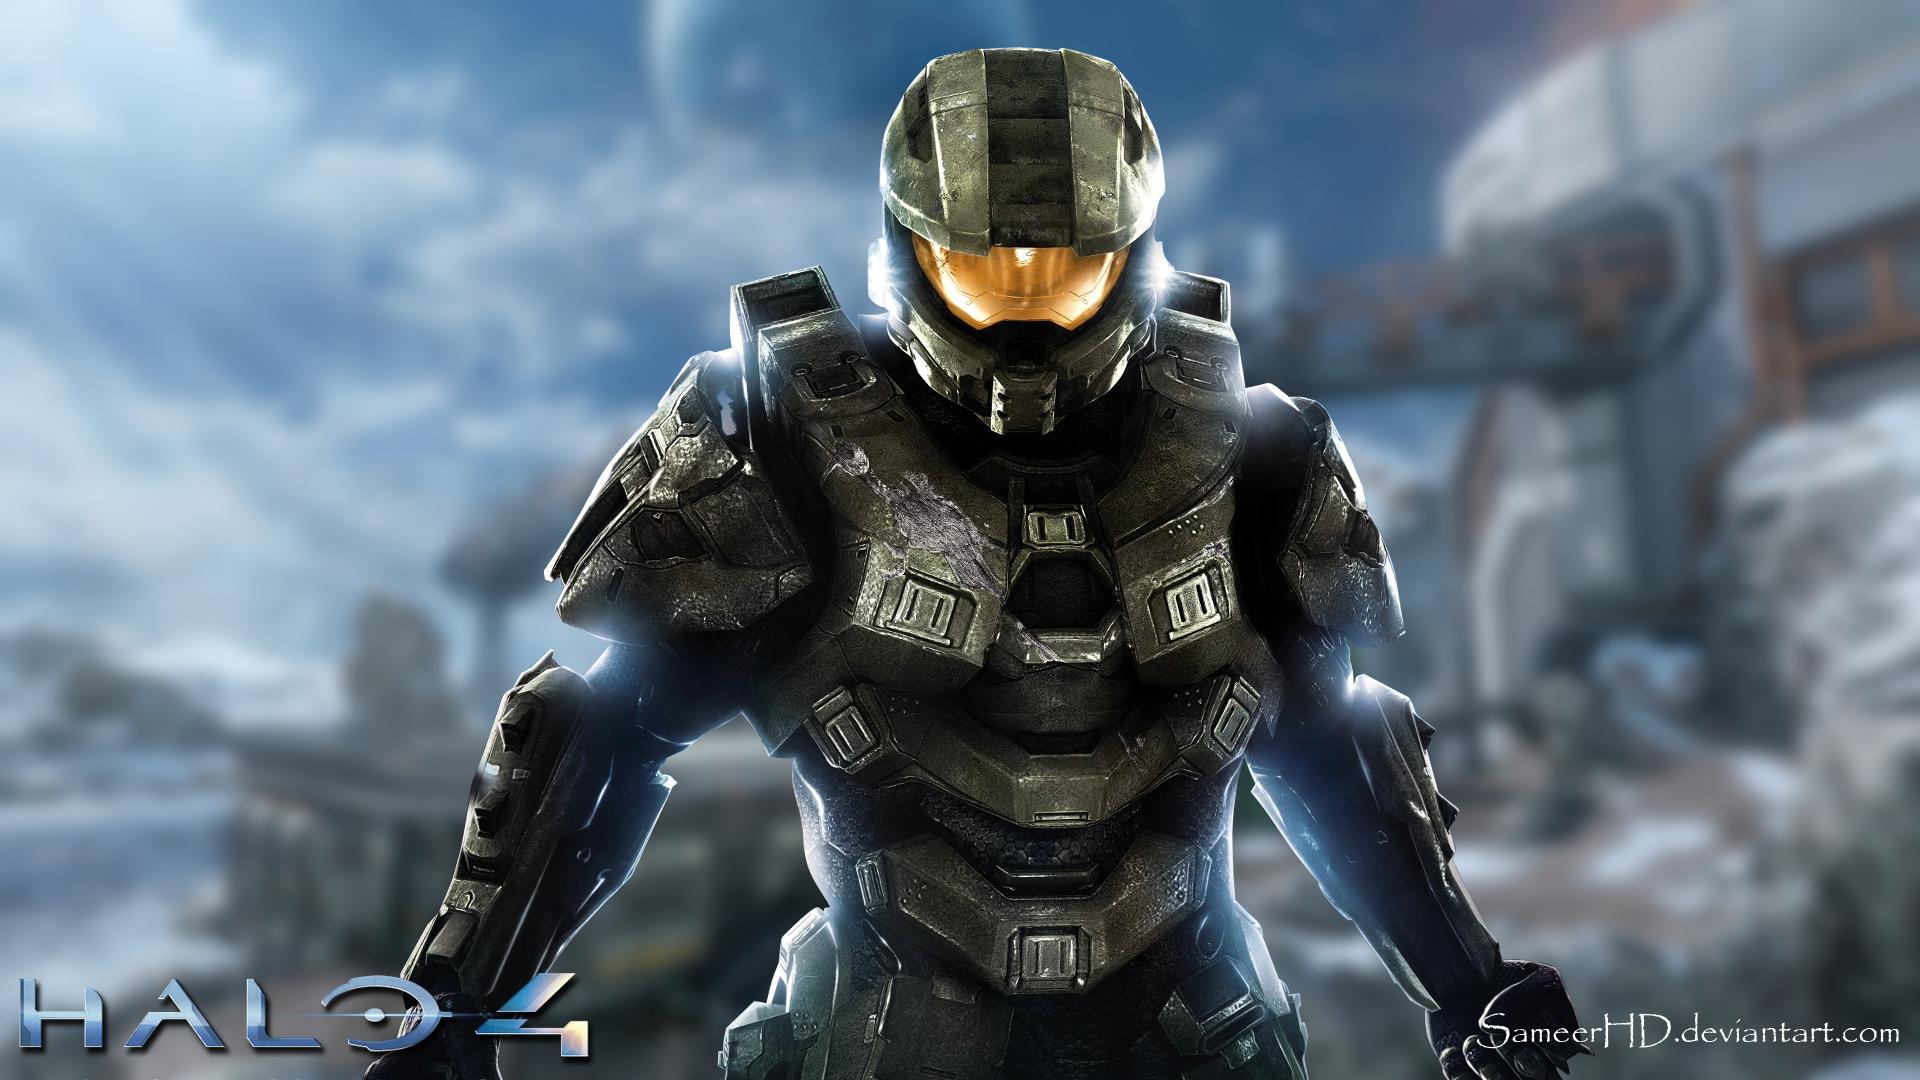 Halo 4 Master Chief Wallpaper By Sameerhd On Deviantart